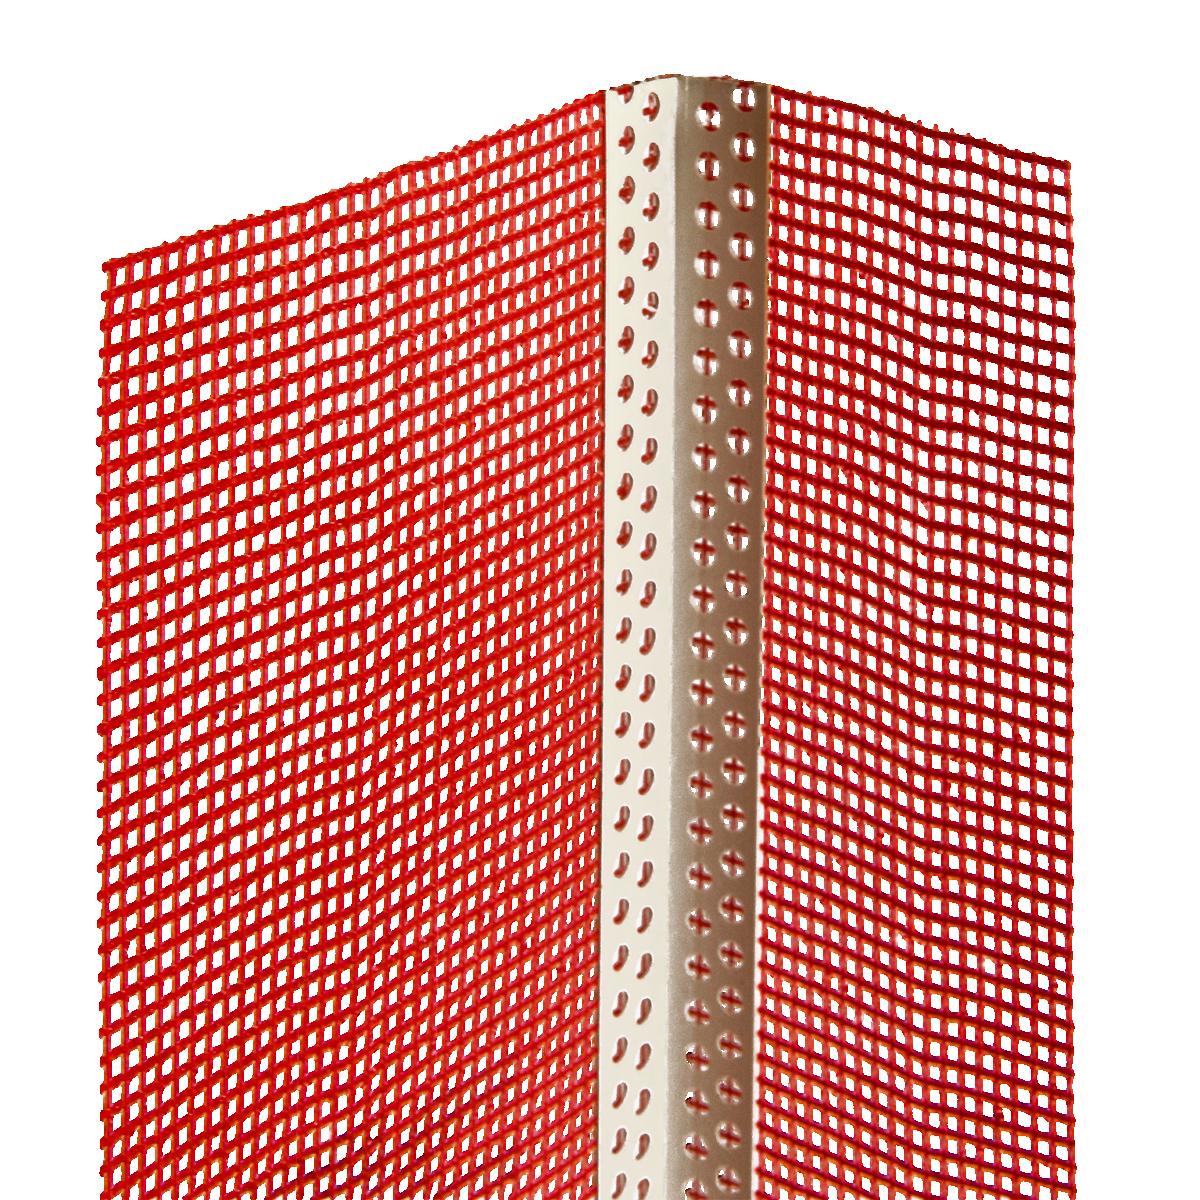 Baumit PVC Corner Beads